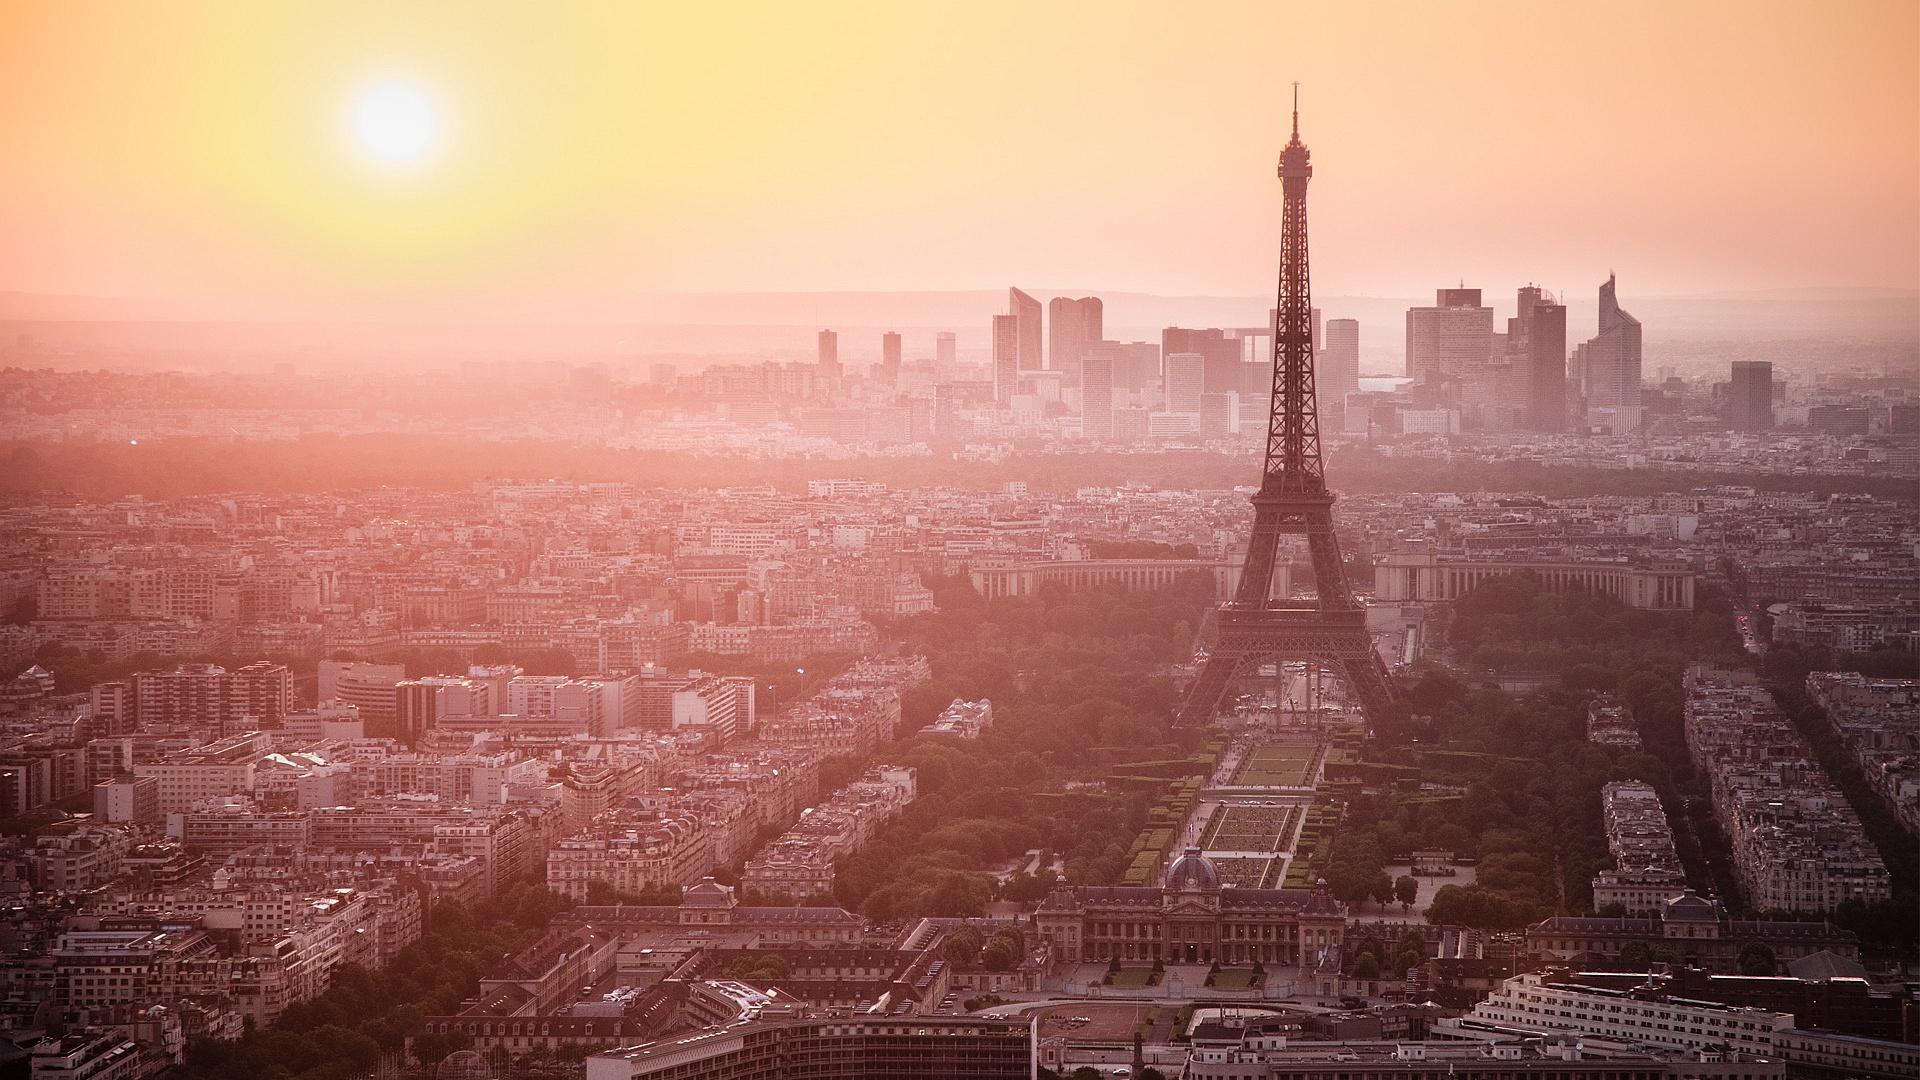 Beautiful Eiffel Tower Paris Wallpaper Full HD 7100 Wallpaper High 1920x1080